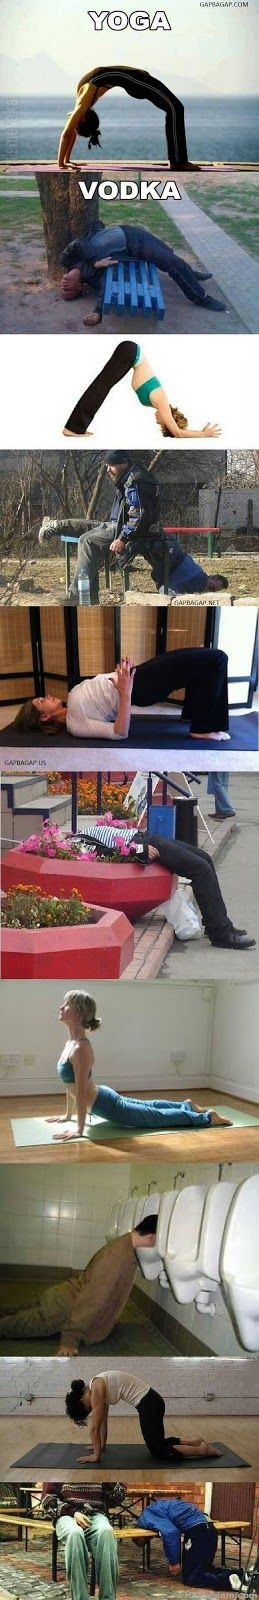 Top 10 Funniest Pictures Of Yoga vs. Vodka